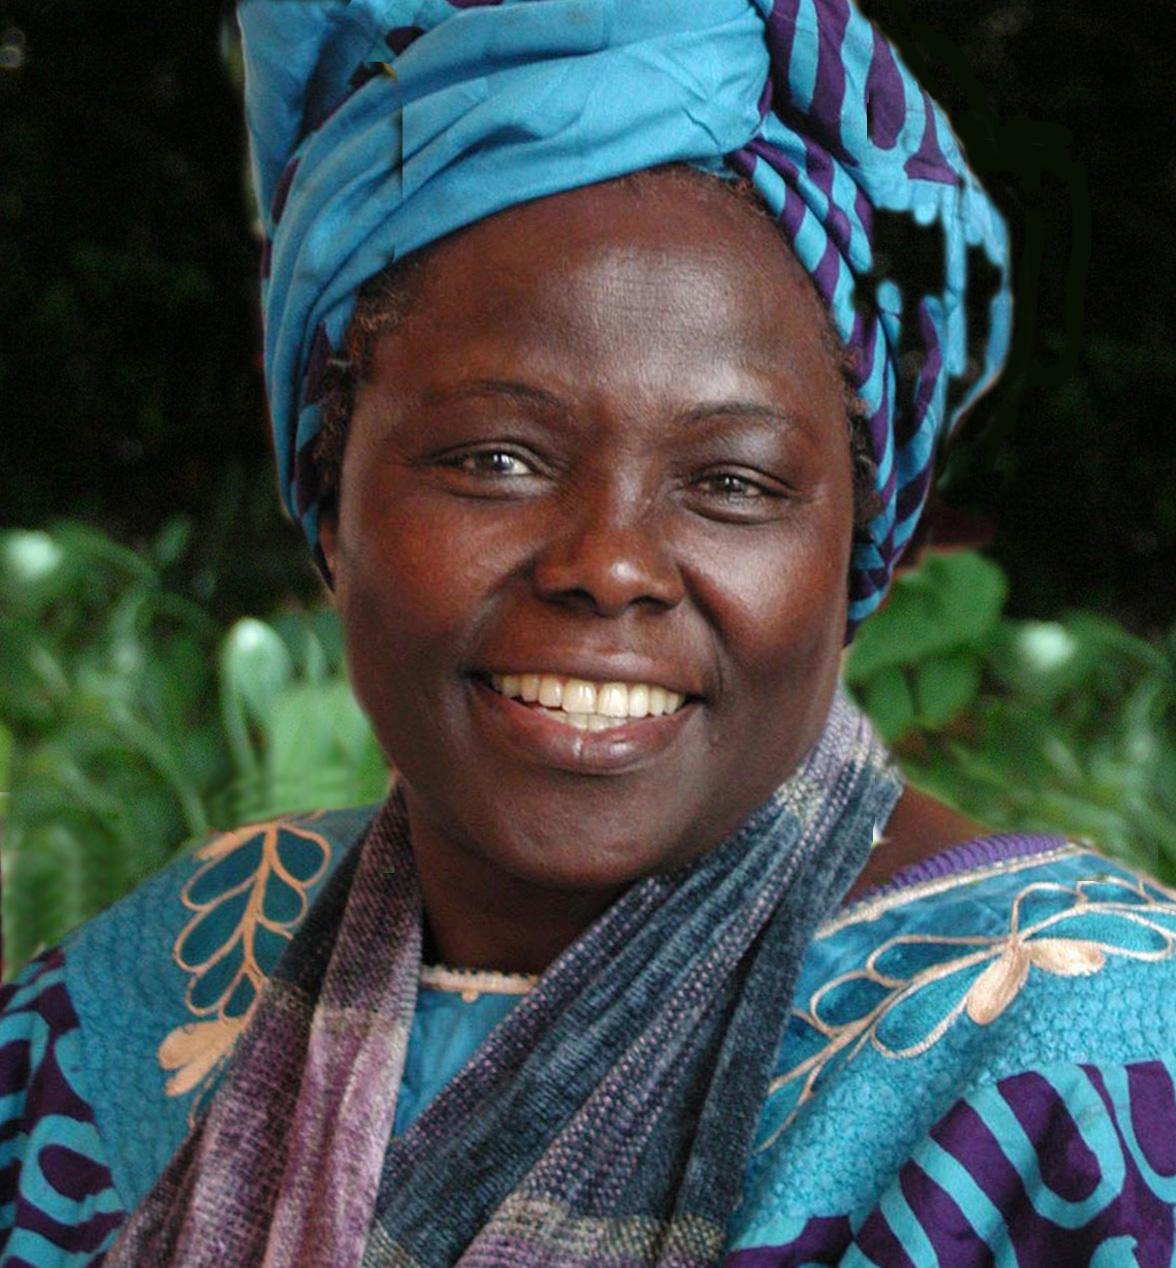 The Life and Leadership of Wangari Maathai